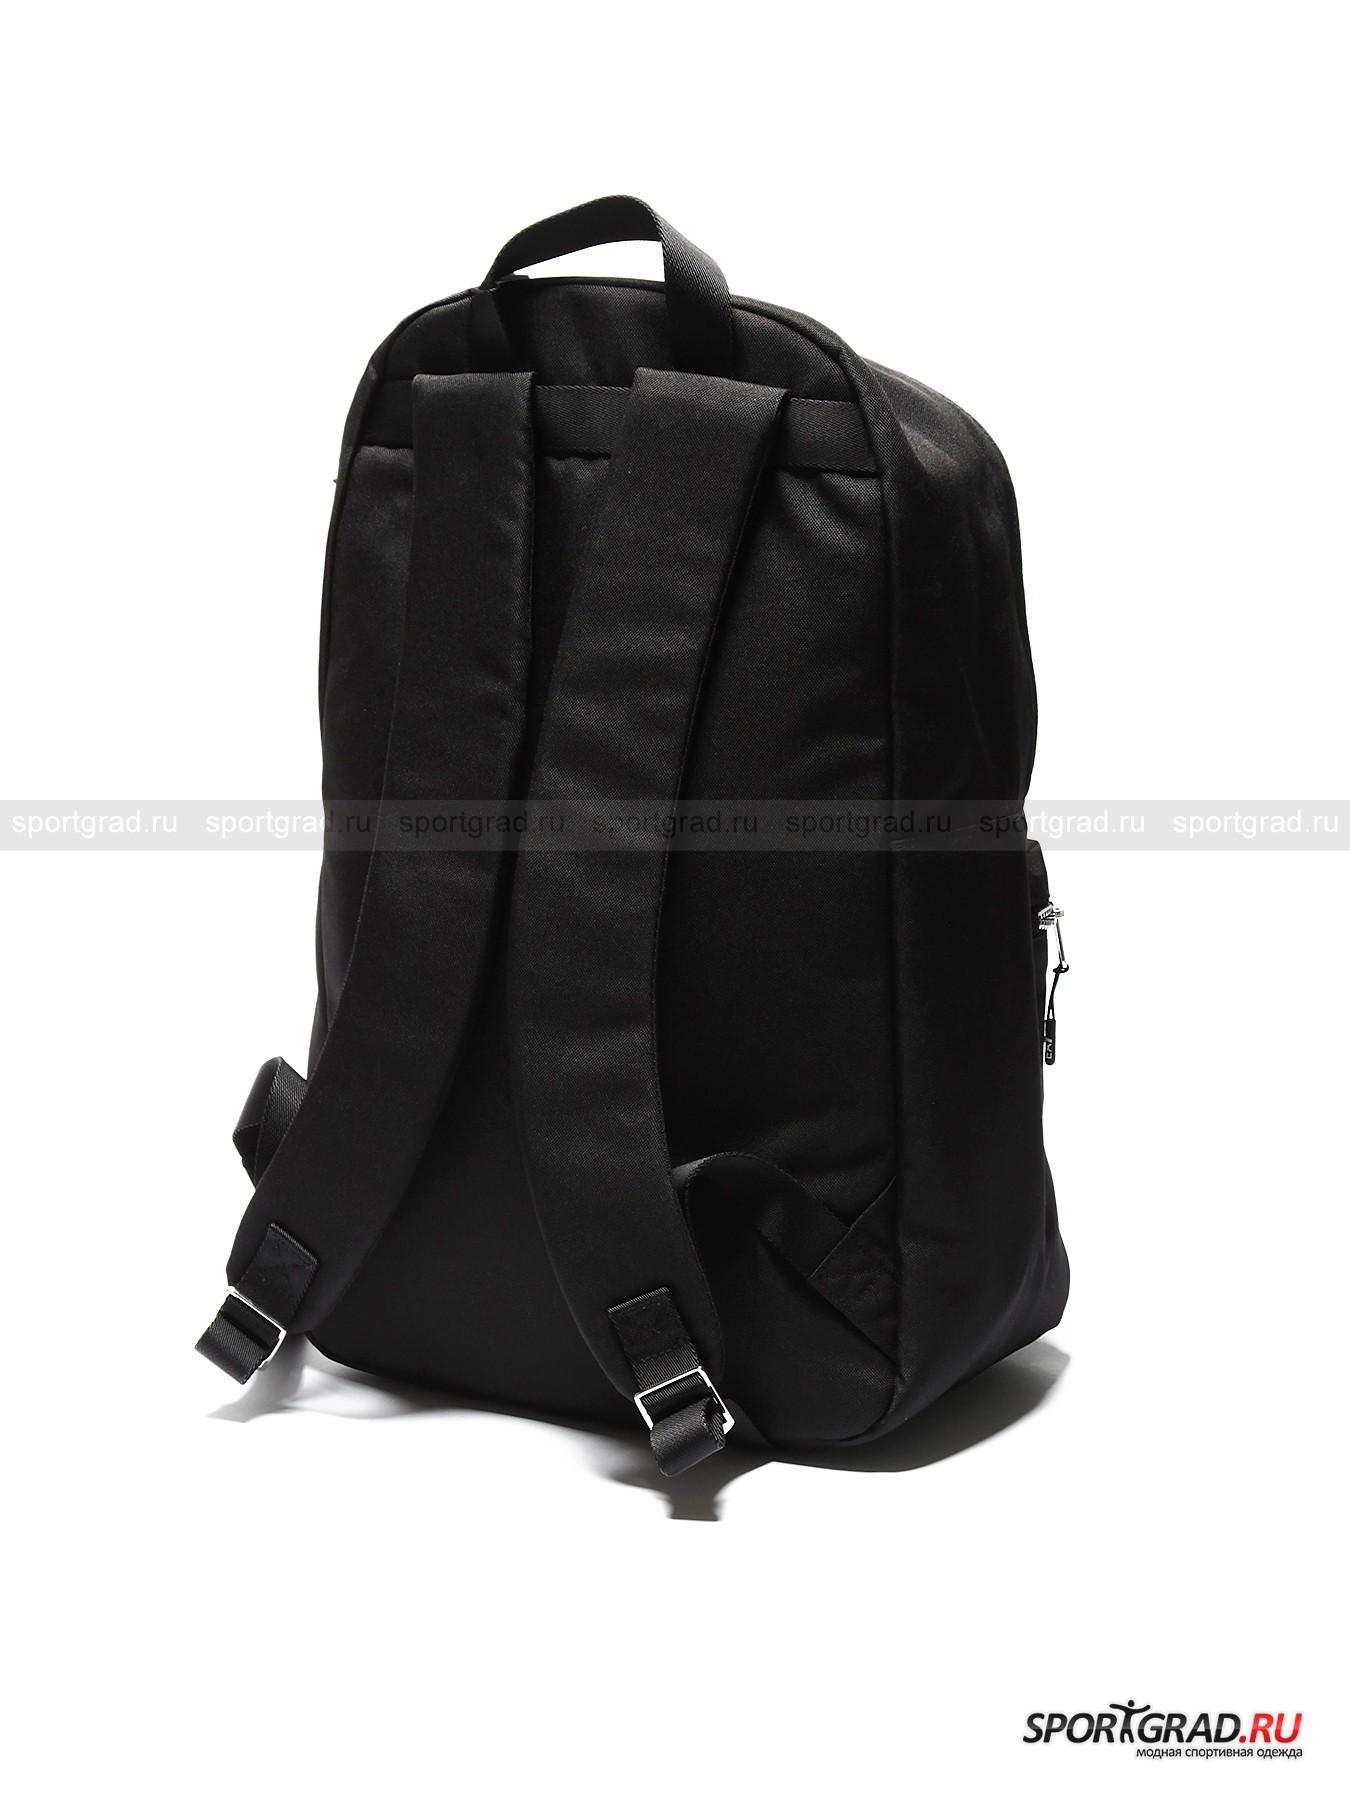 Рюкзак Core ID Backpack EA7 Emporio Armani от Спортград